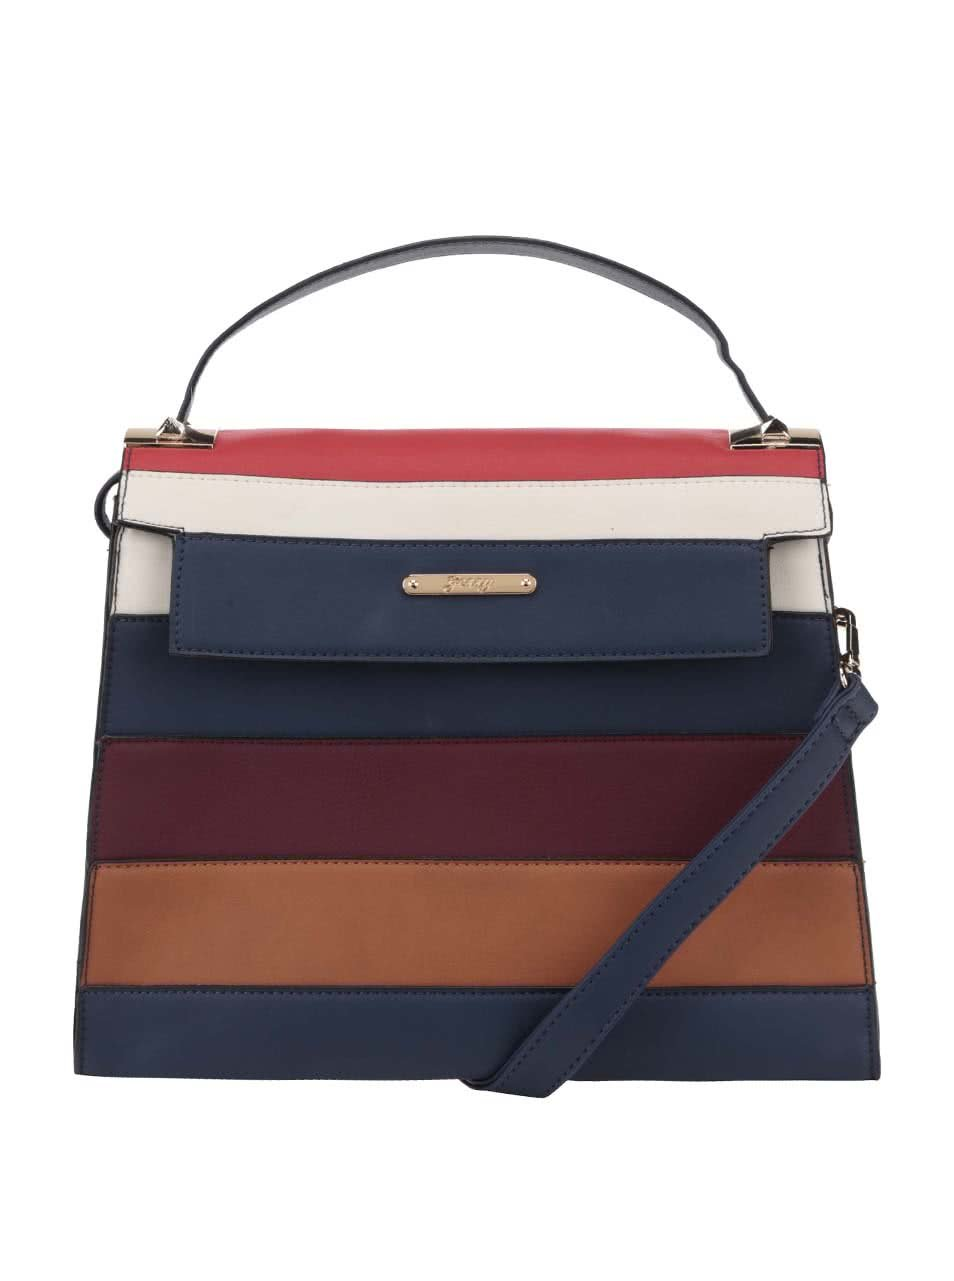 Tmavomodrá crossbody kabelka s farebnými pruhmi Gessy ... f9464cf001d